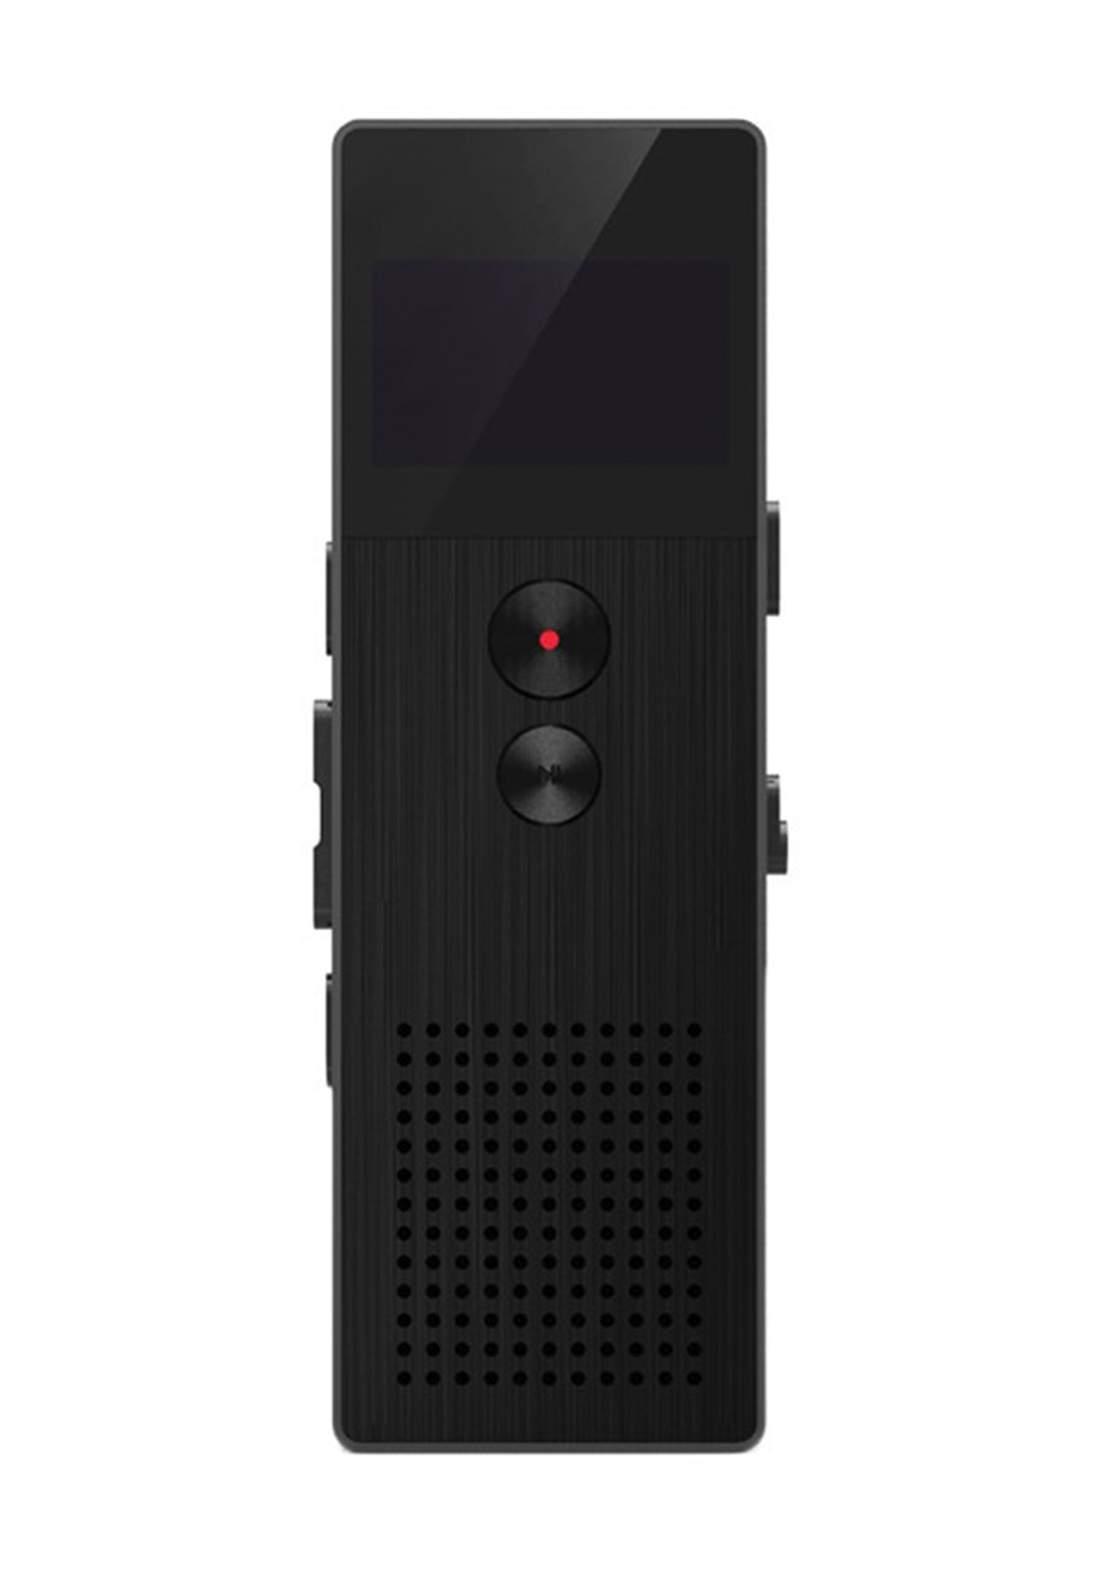 Remax Rp1 Oled Digital Voice Recorder - 8gb 32h Hd - Black